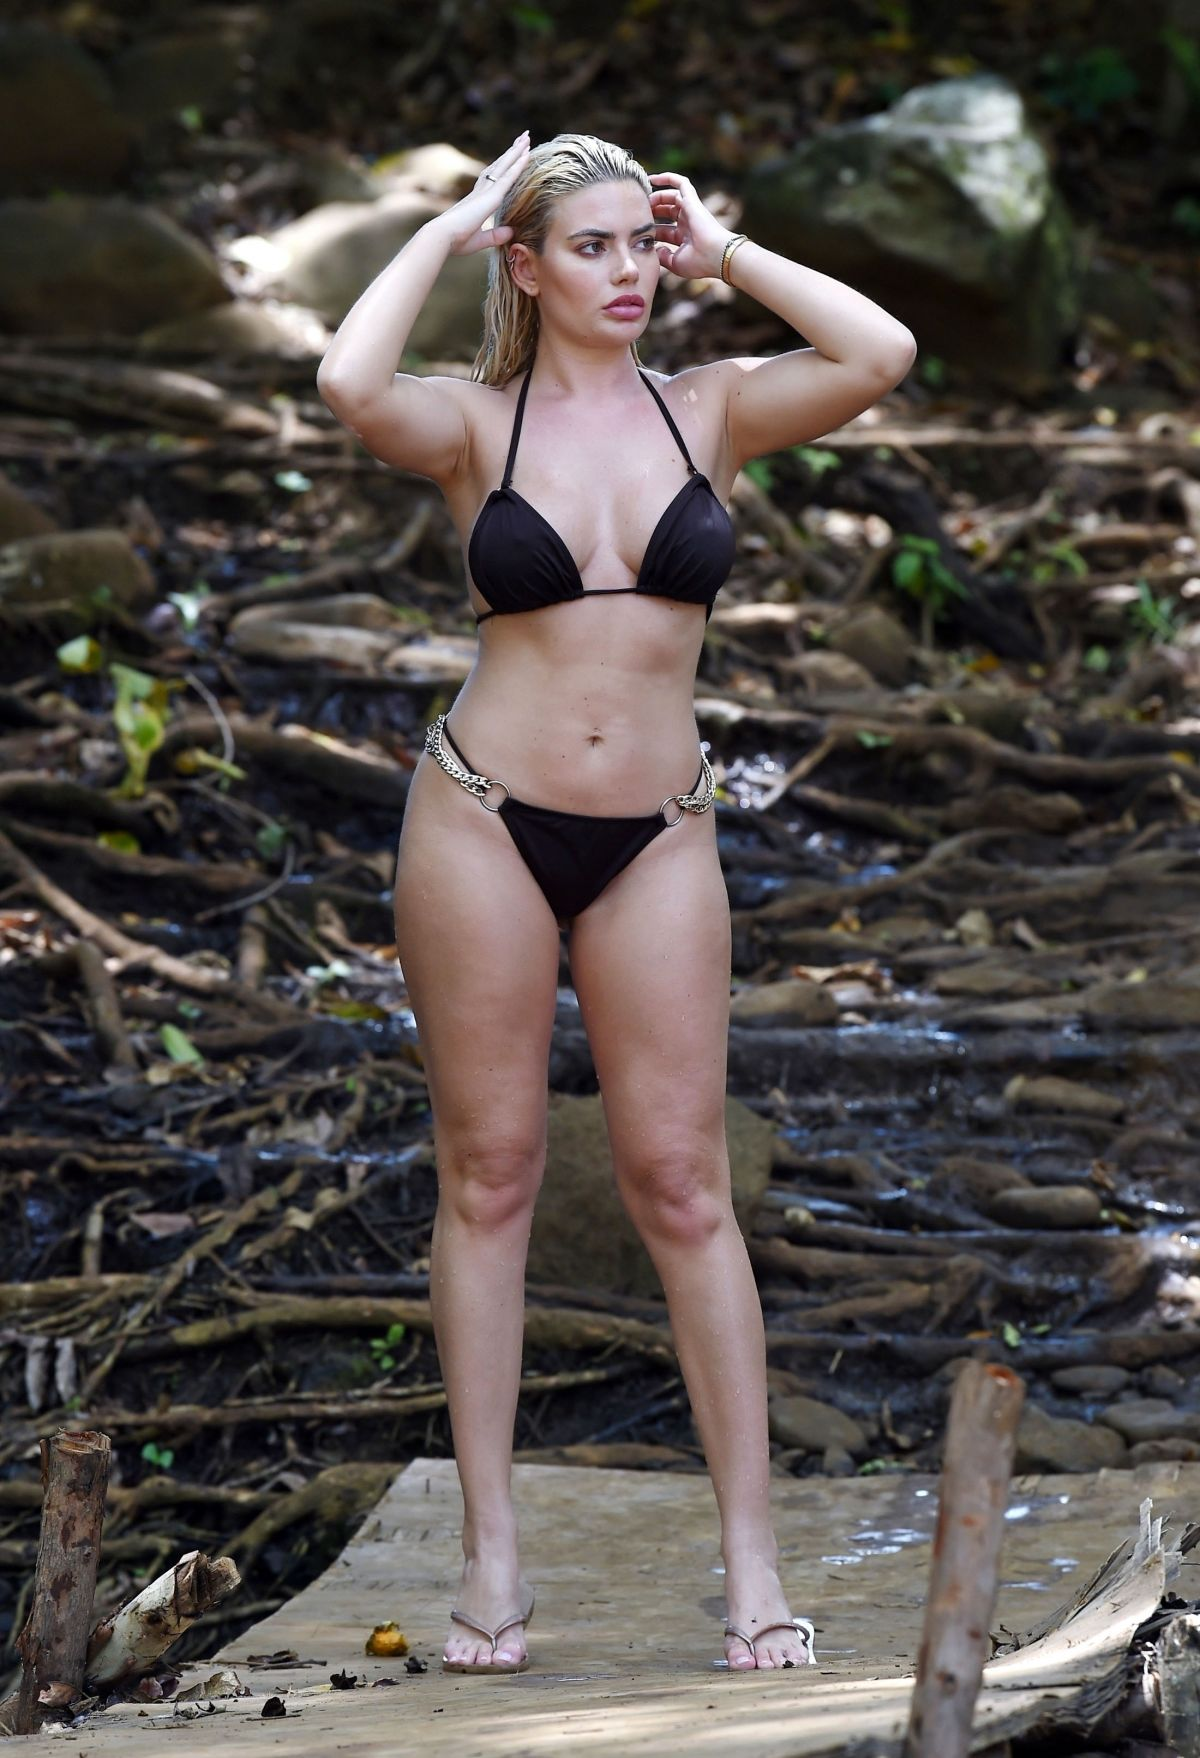 Bikini Megan Barton-Hanson naked (25 photo), Topless, Sideboobs, Feet, panties 2006